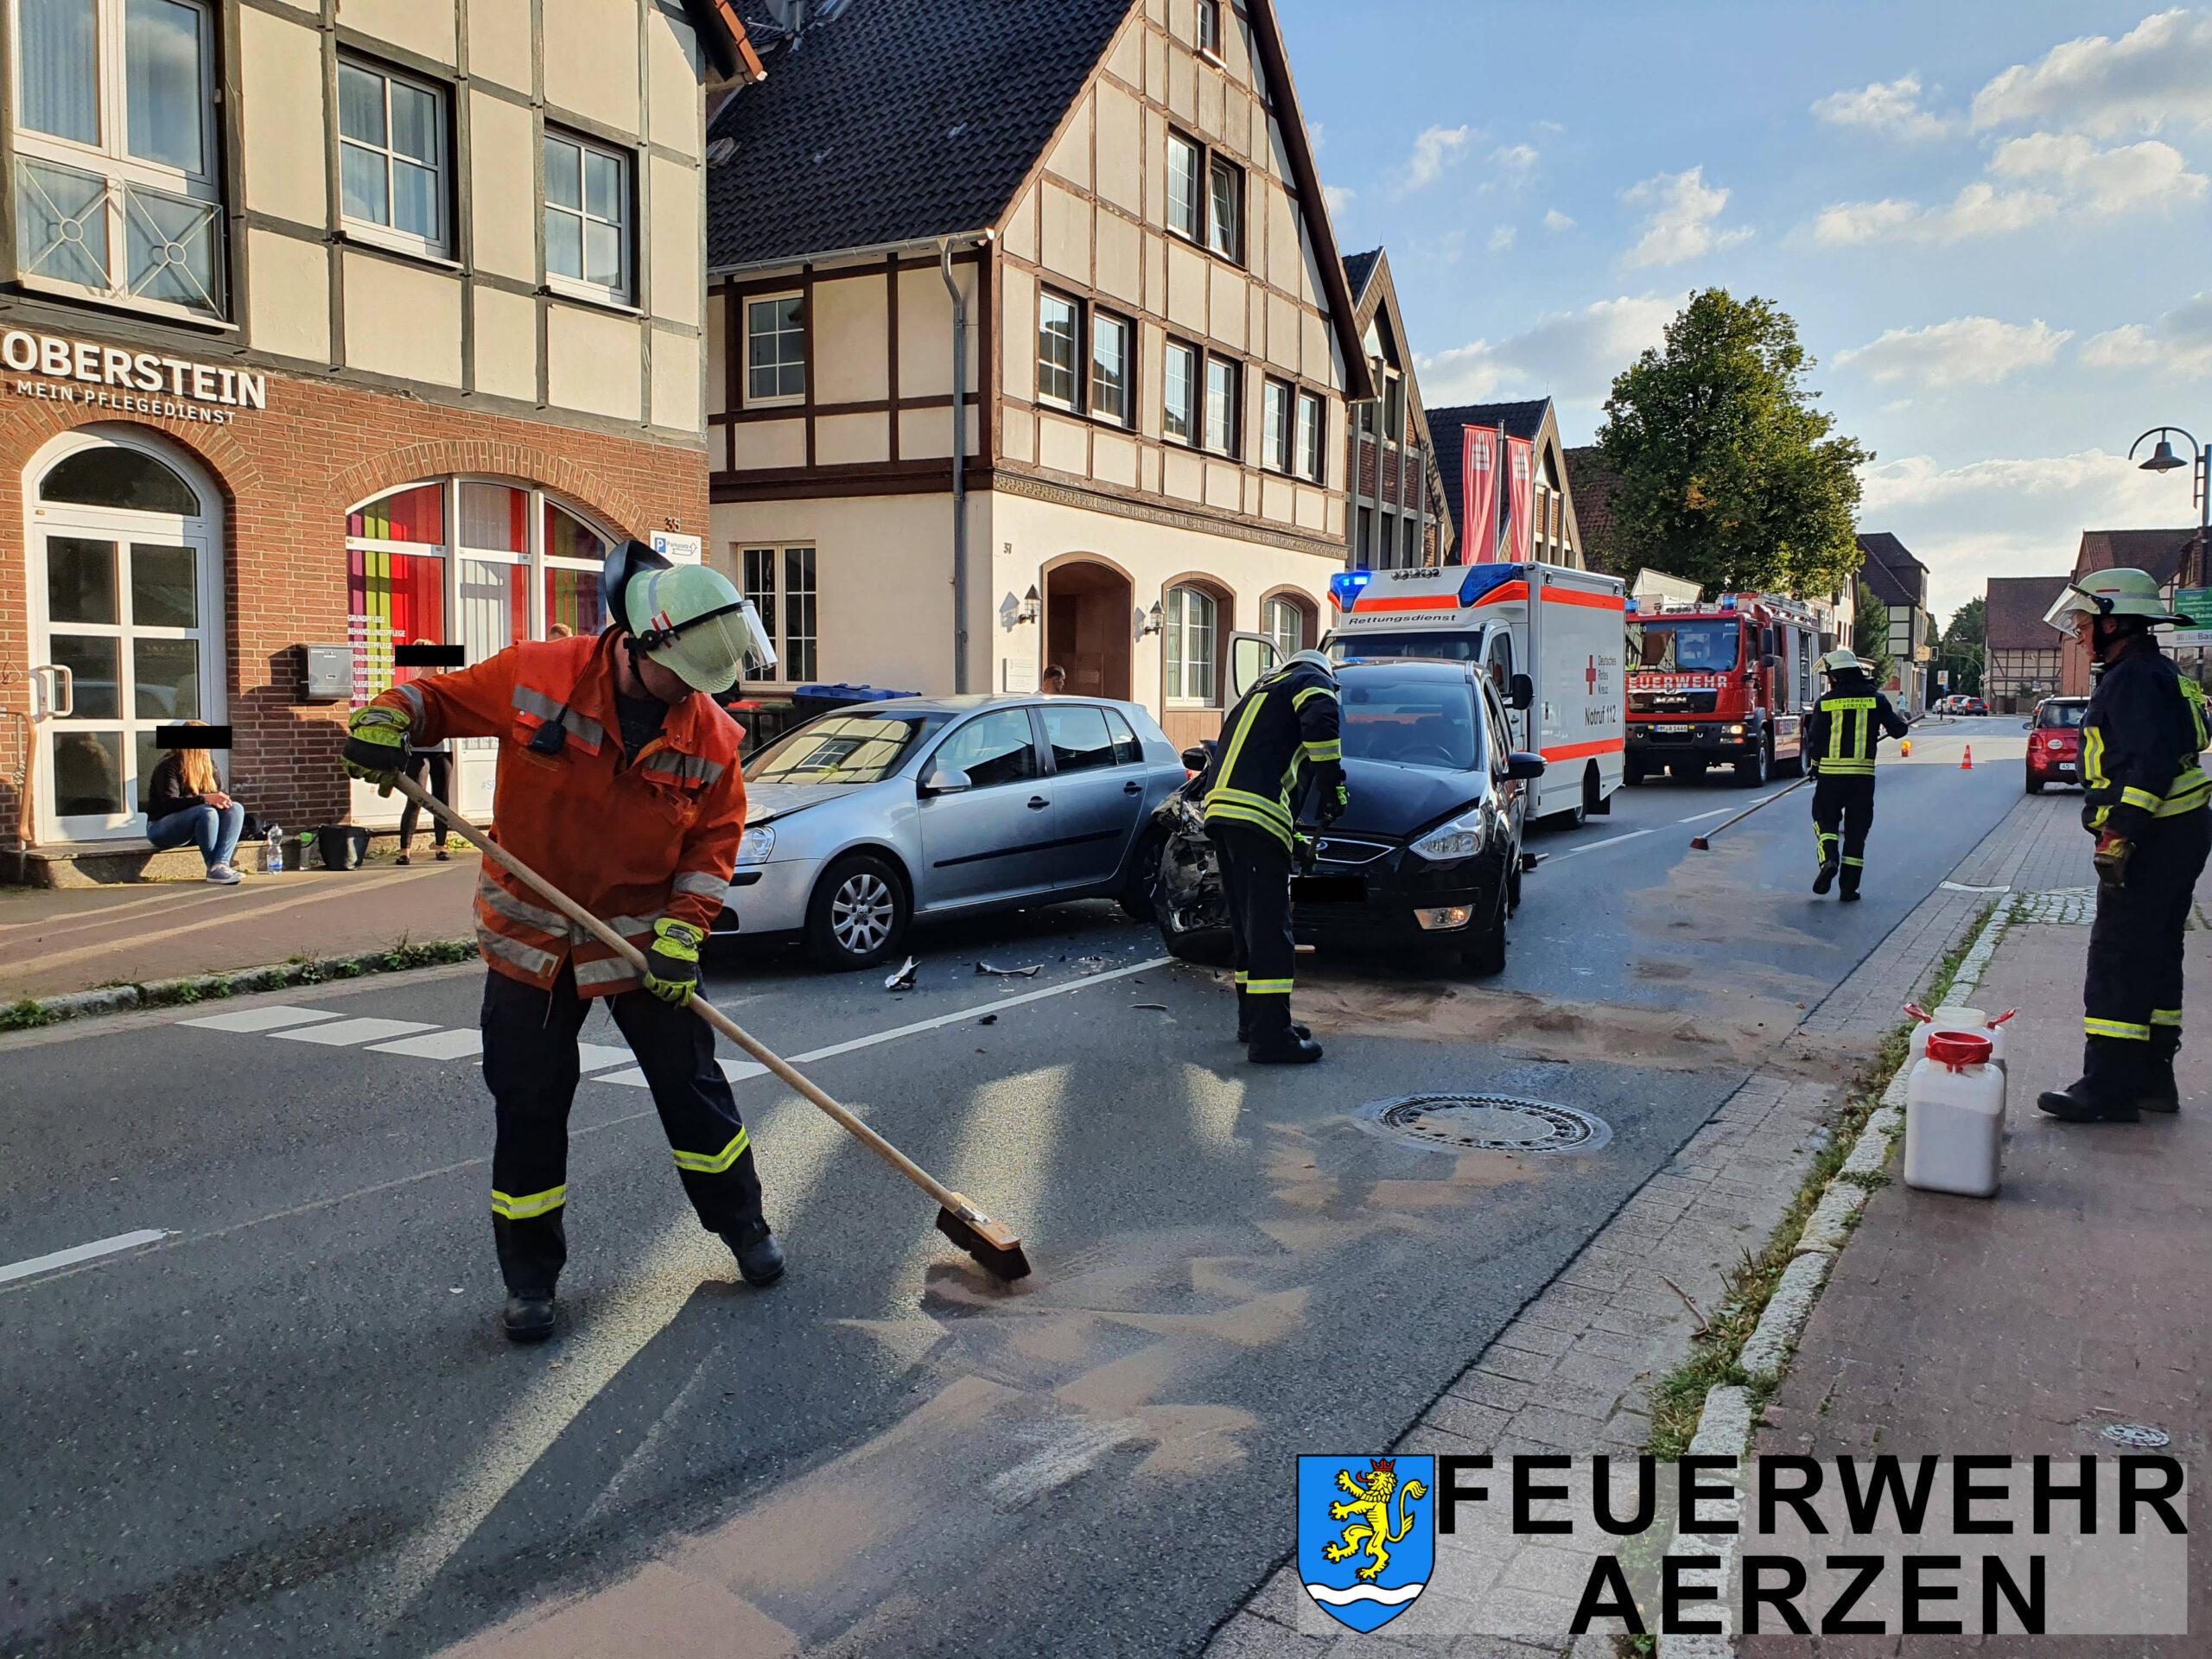 2021-09-01 Kleinschleife Aerzen VU Alarm auslaufende Betriebsstoffe